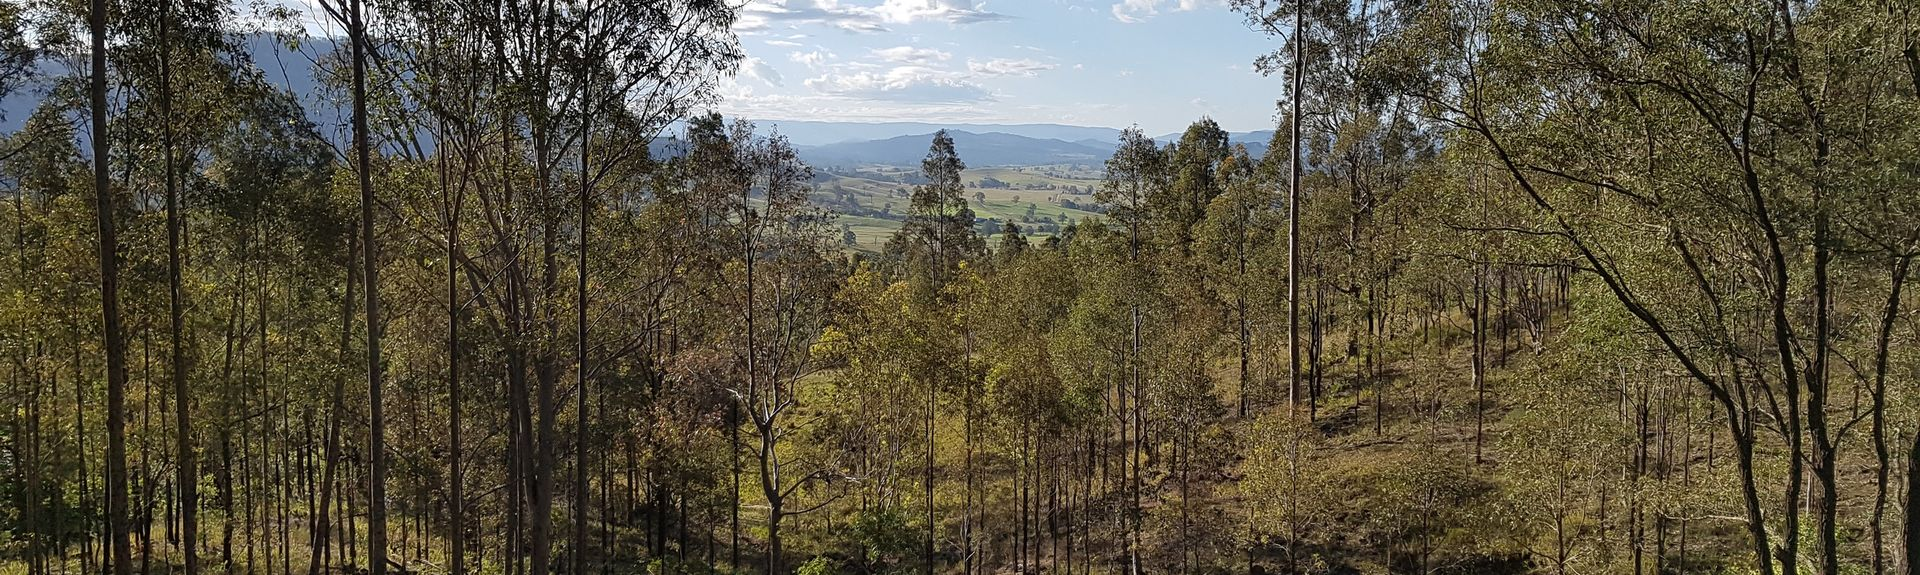 Rosebrook, Nouvelle Galles du Sud, Australie